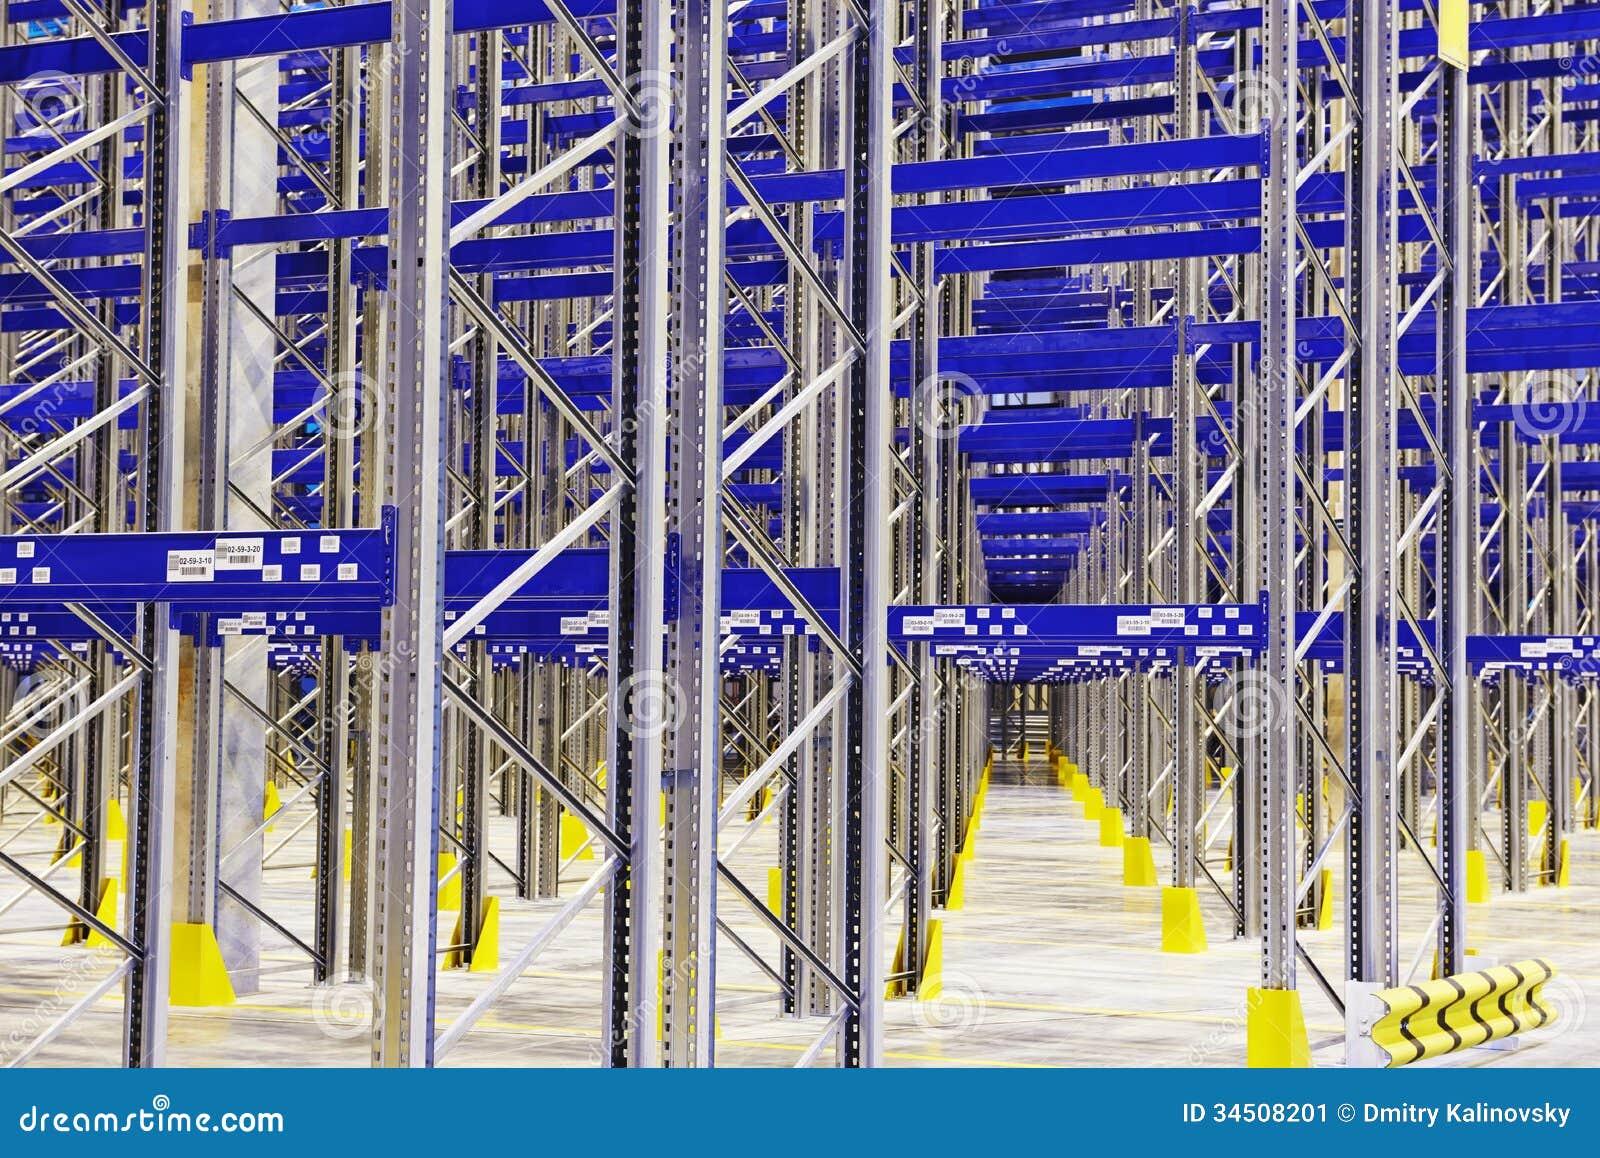 New modern warehouse rack